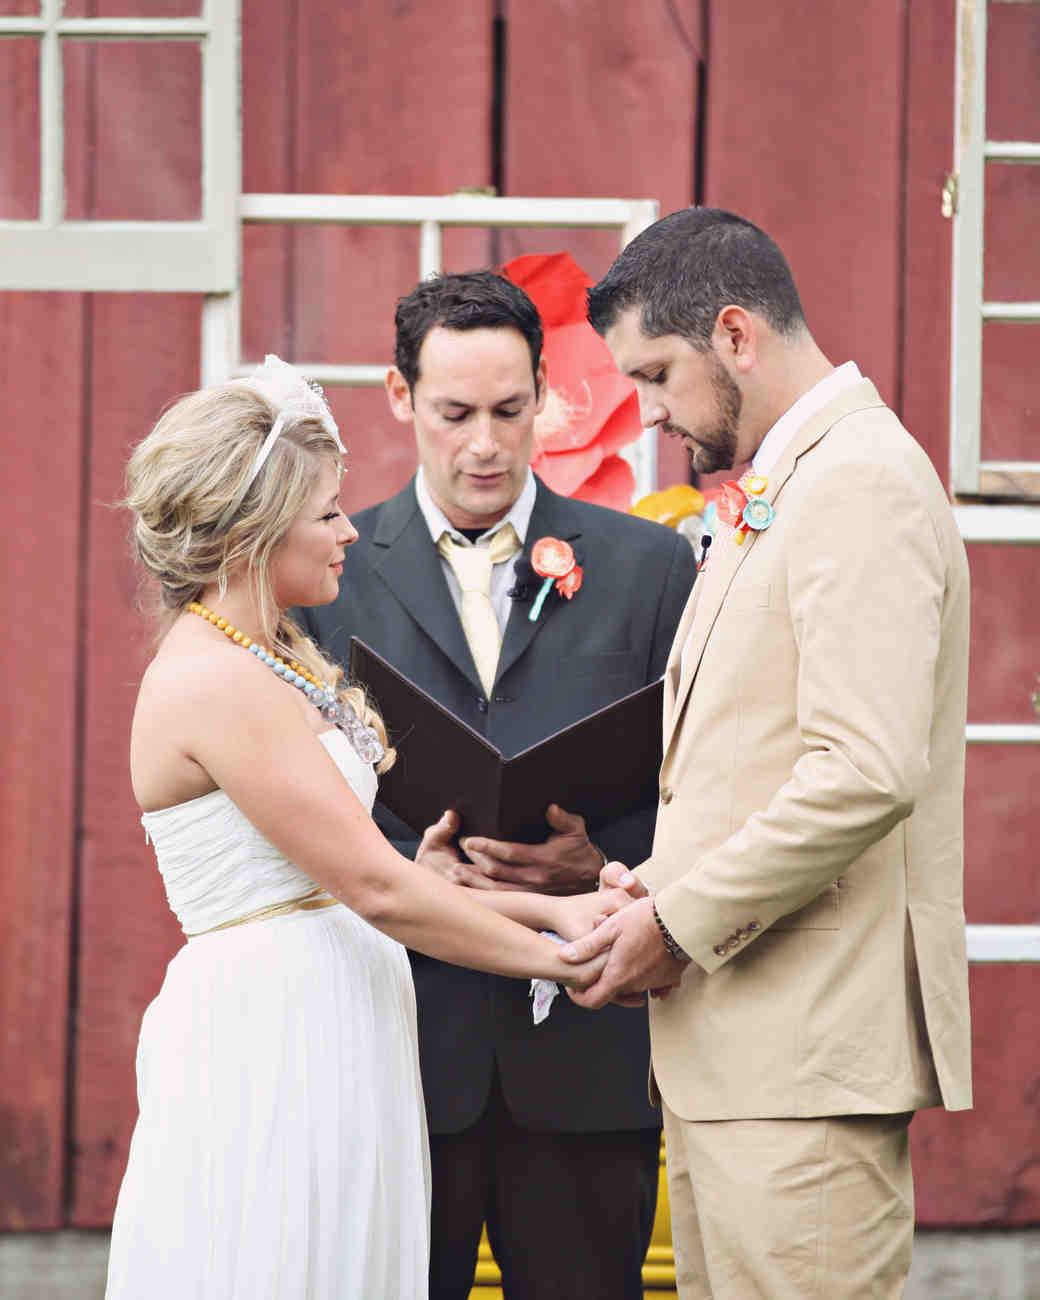 real-weddings-nichole-matthew-wd0413-147.jpg